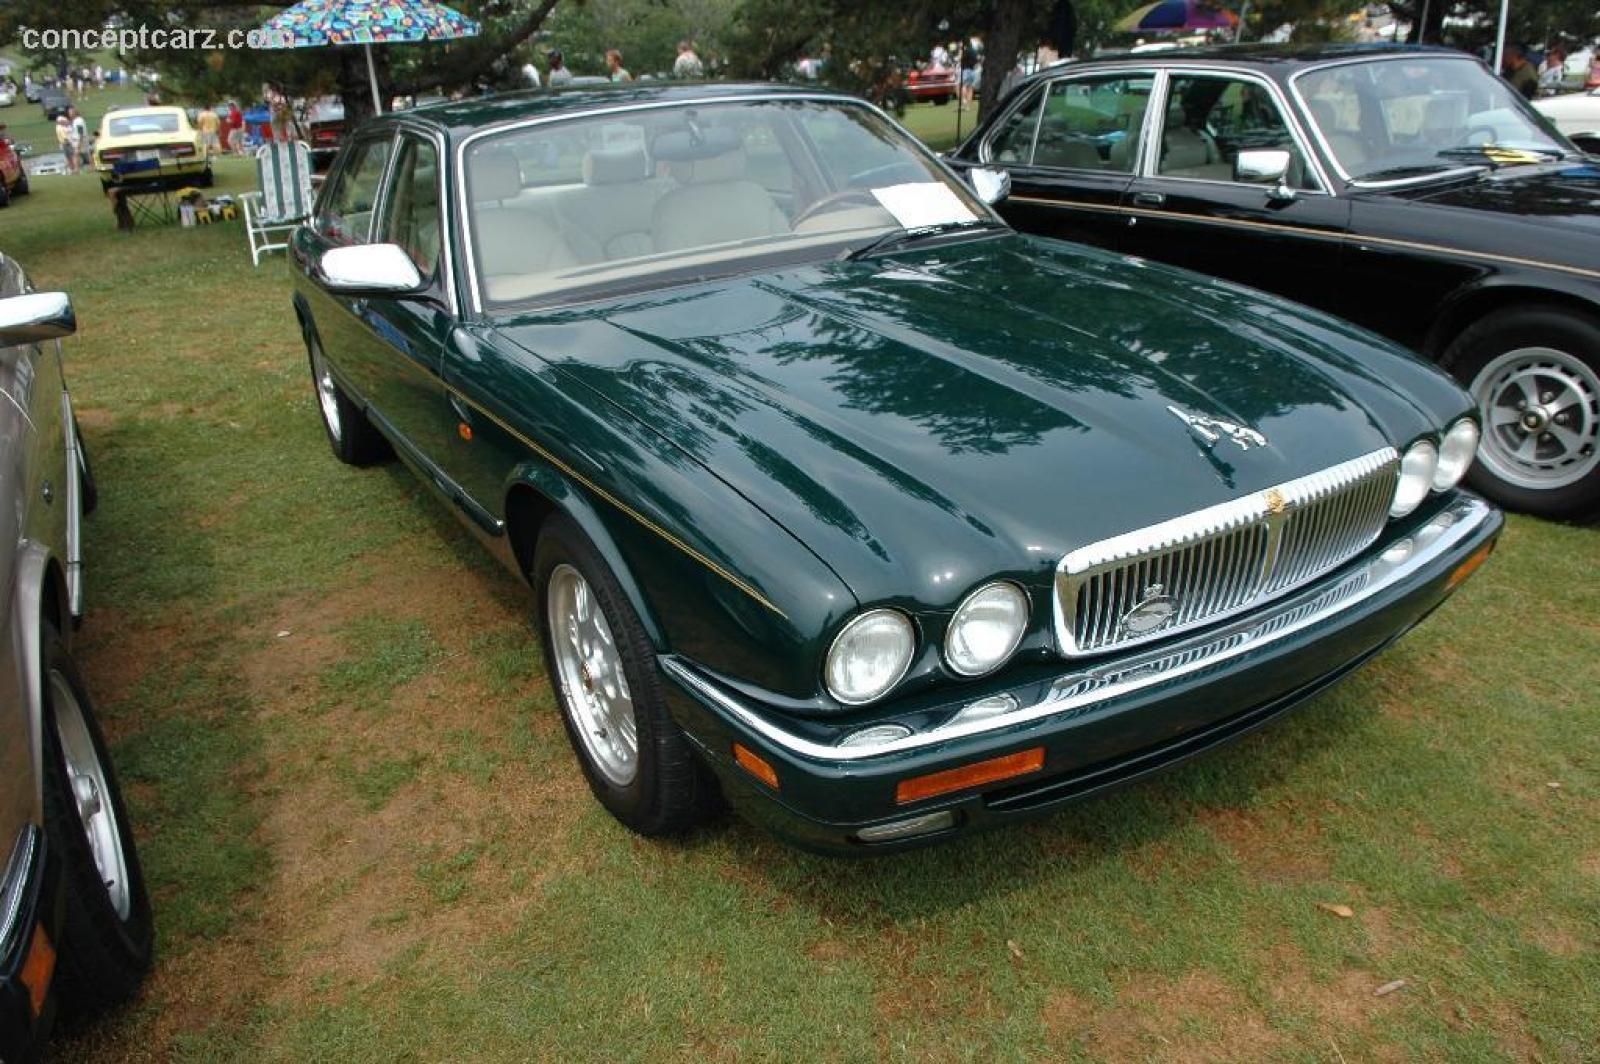 1995 jaguar xjr 1 800 1024 1280 1600 origin